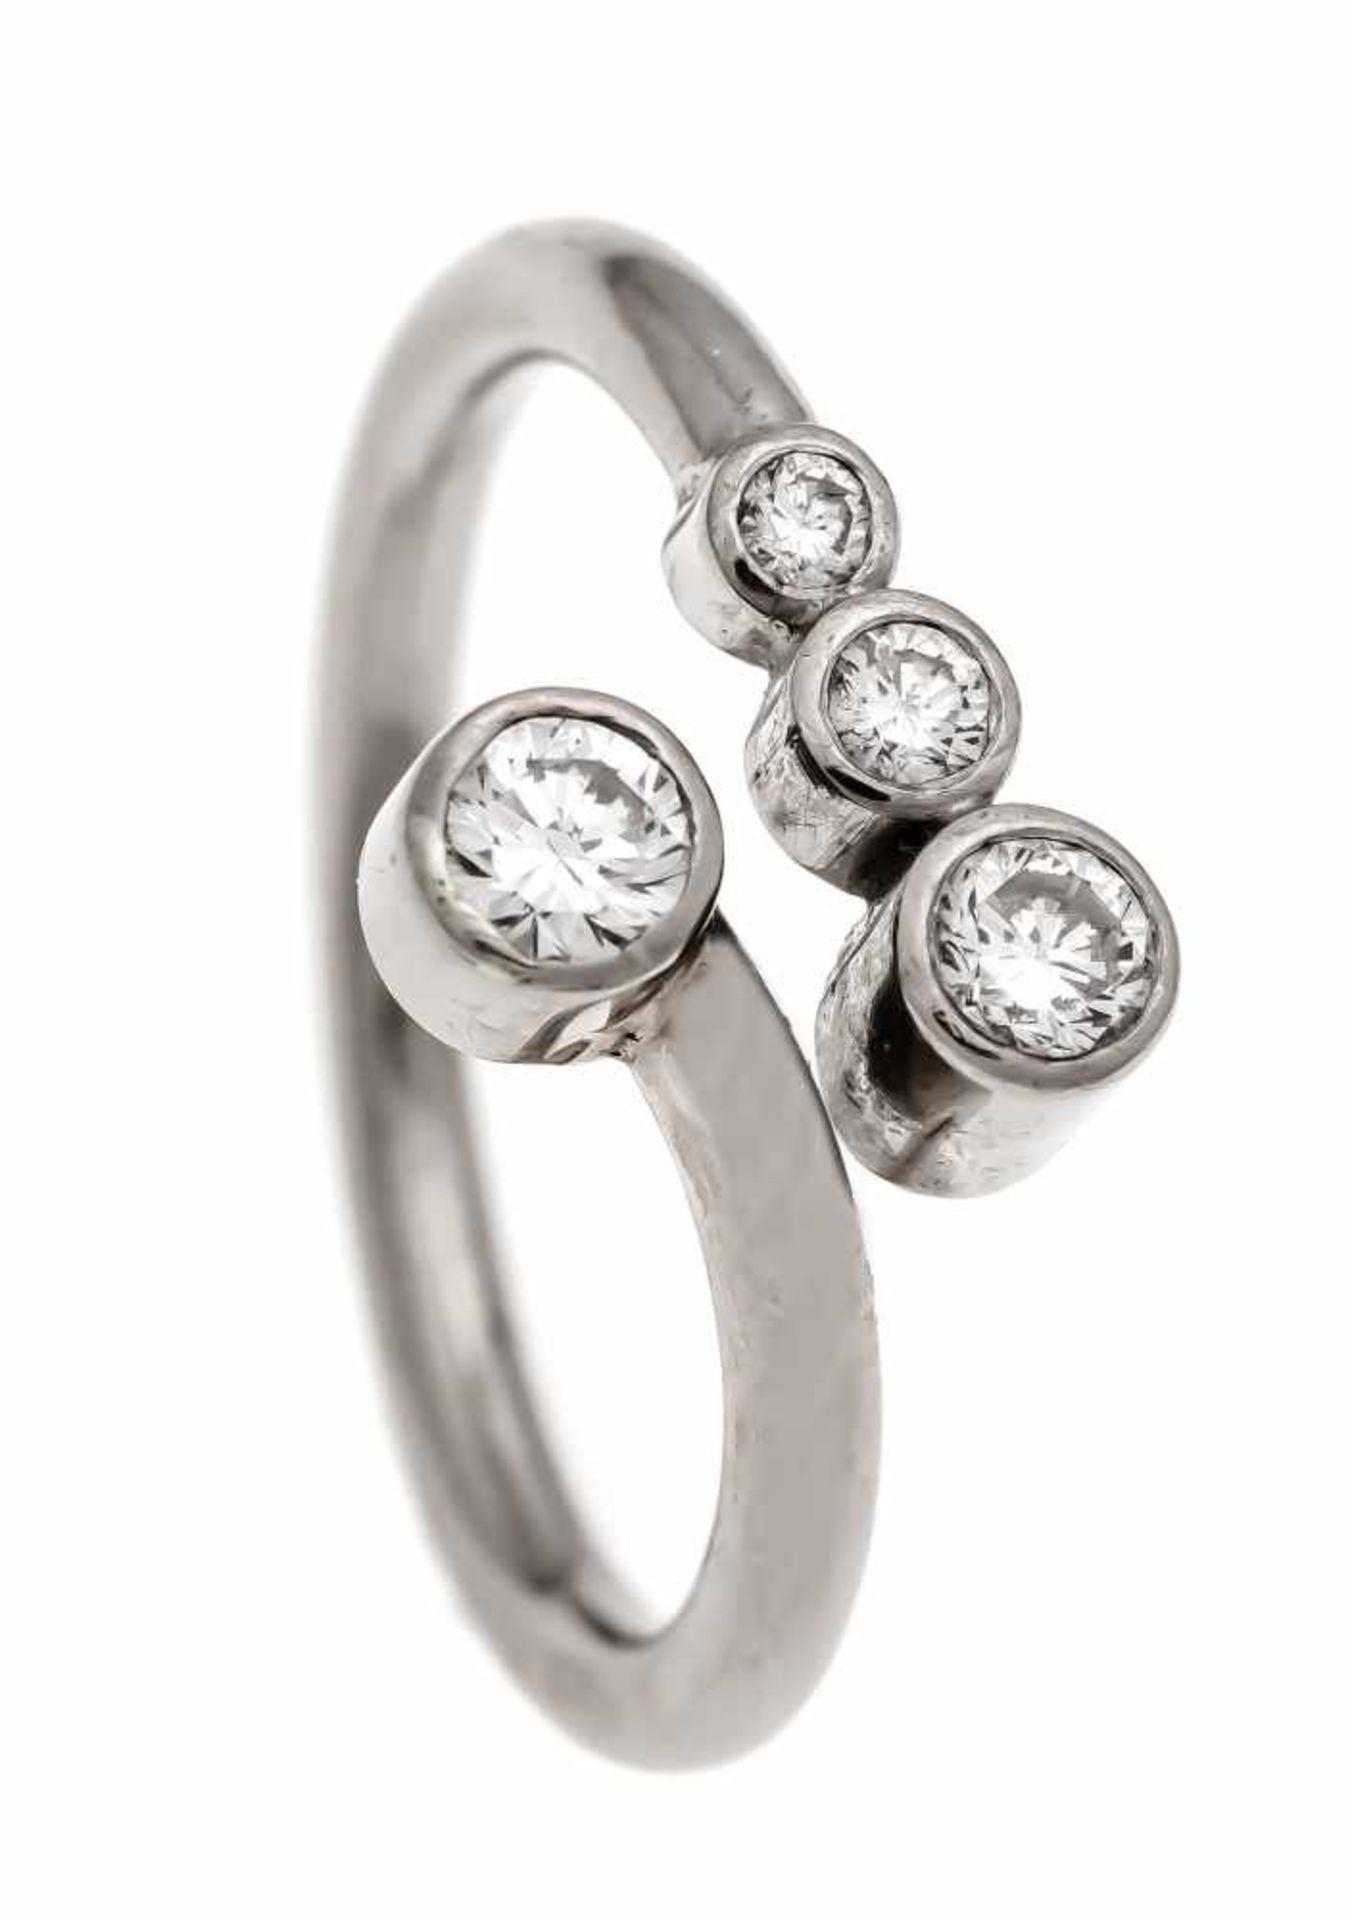 Brillant-Ring WG 750/000 mit 4 Brillanten, zus. 0,40 ct W/VS-SI, RG 60 (offen), 6,6 gBrilliant